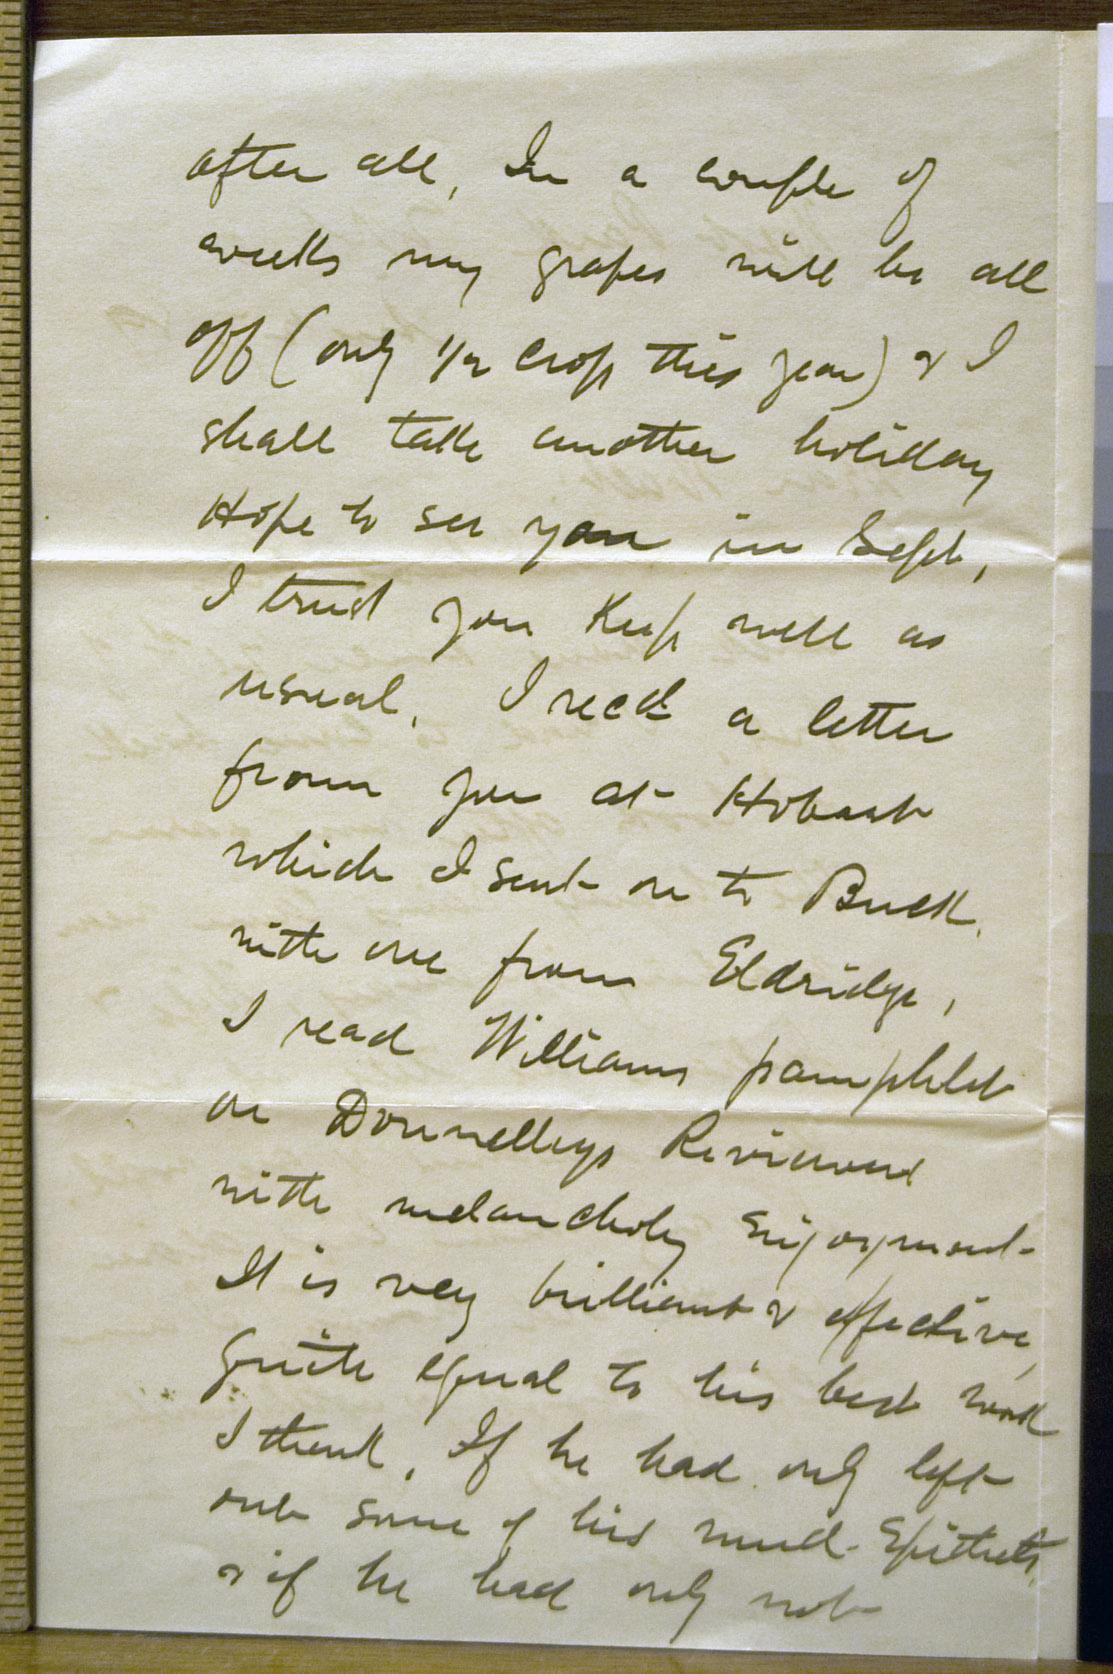 John Burroughs to Walt Whitman, 27 August 1889